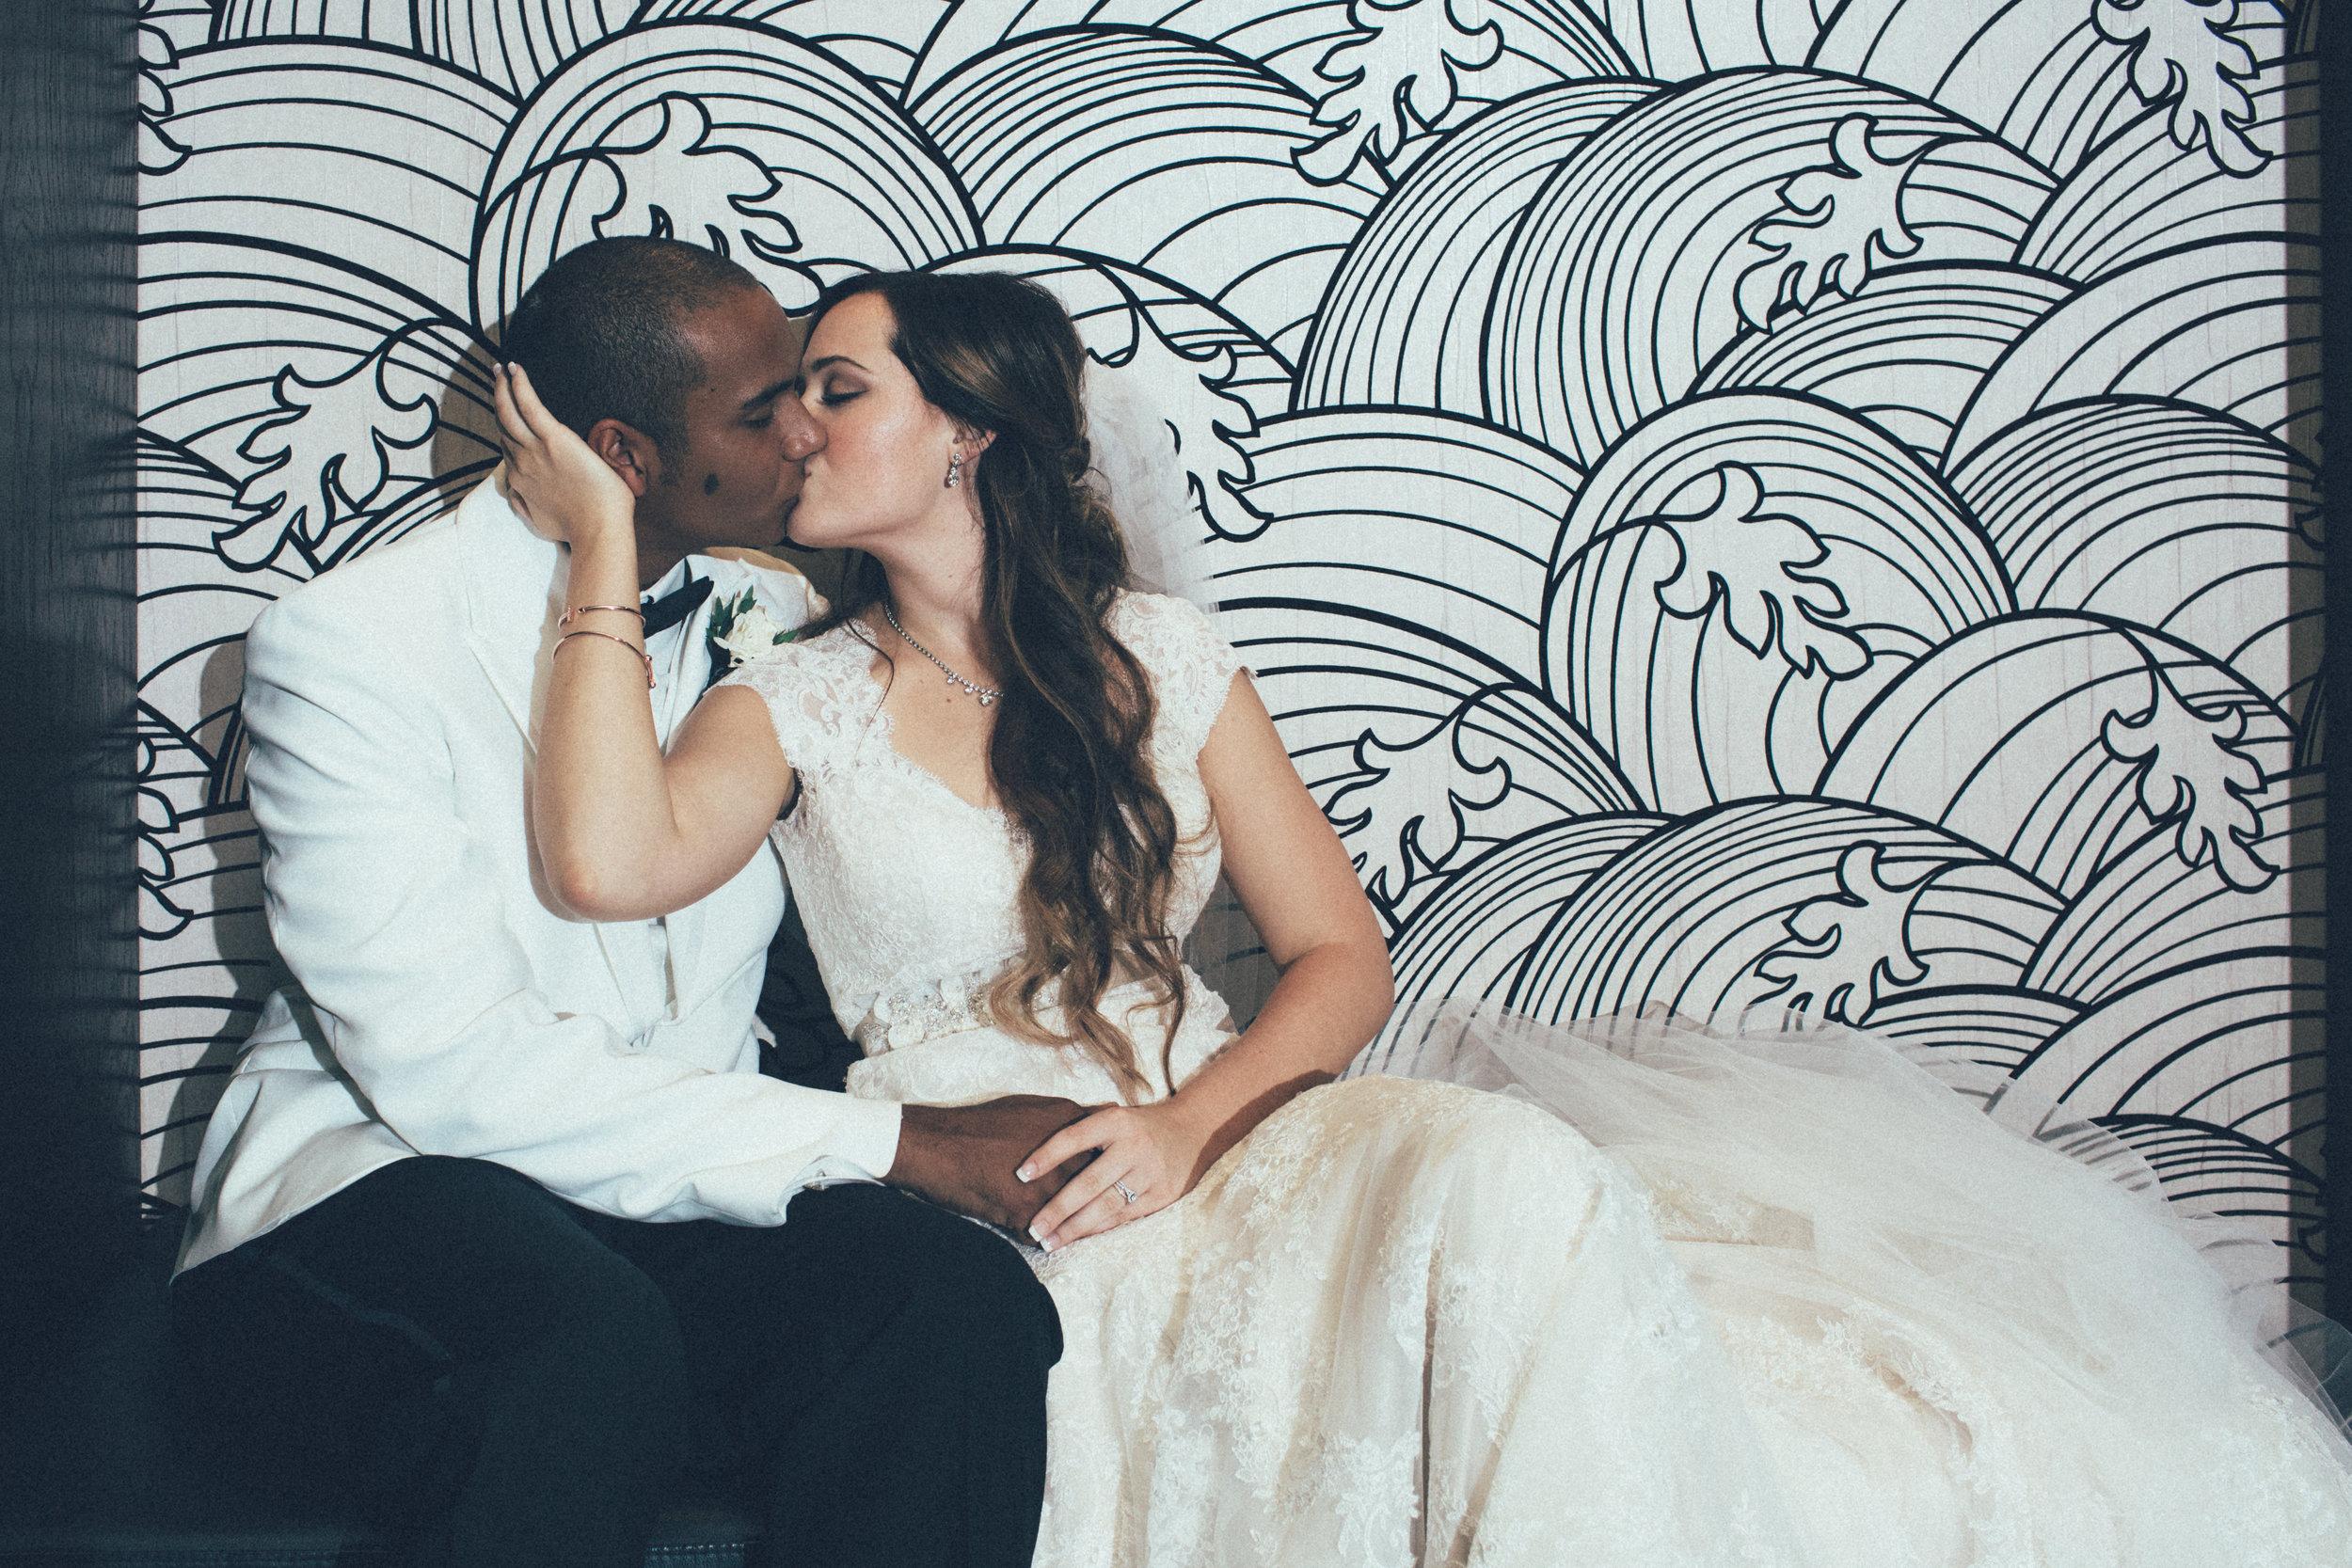 Mark Fierst Minneapolis Wedding Photographer | Sixpence Standard blog post | artistic backdrop